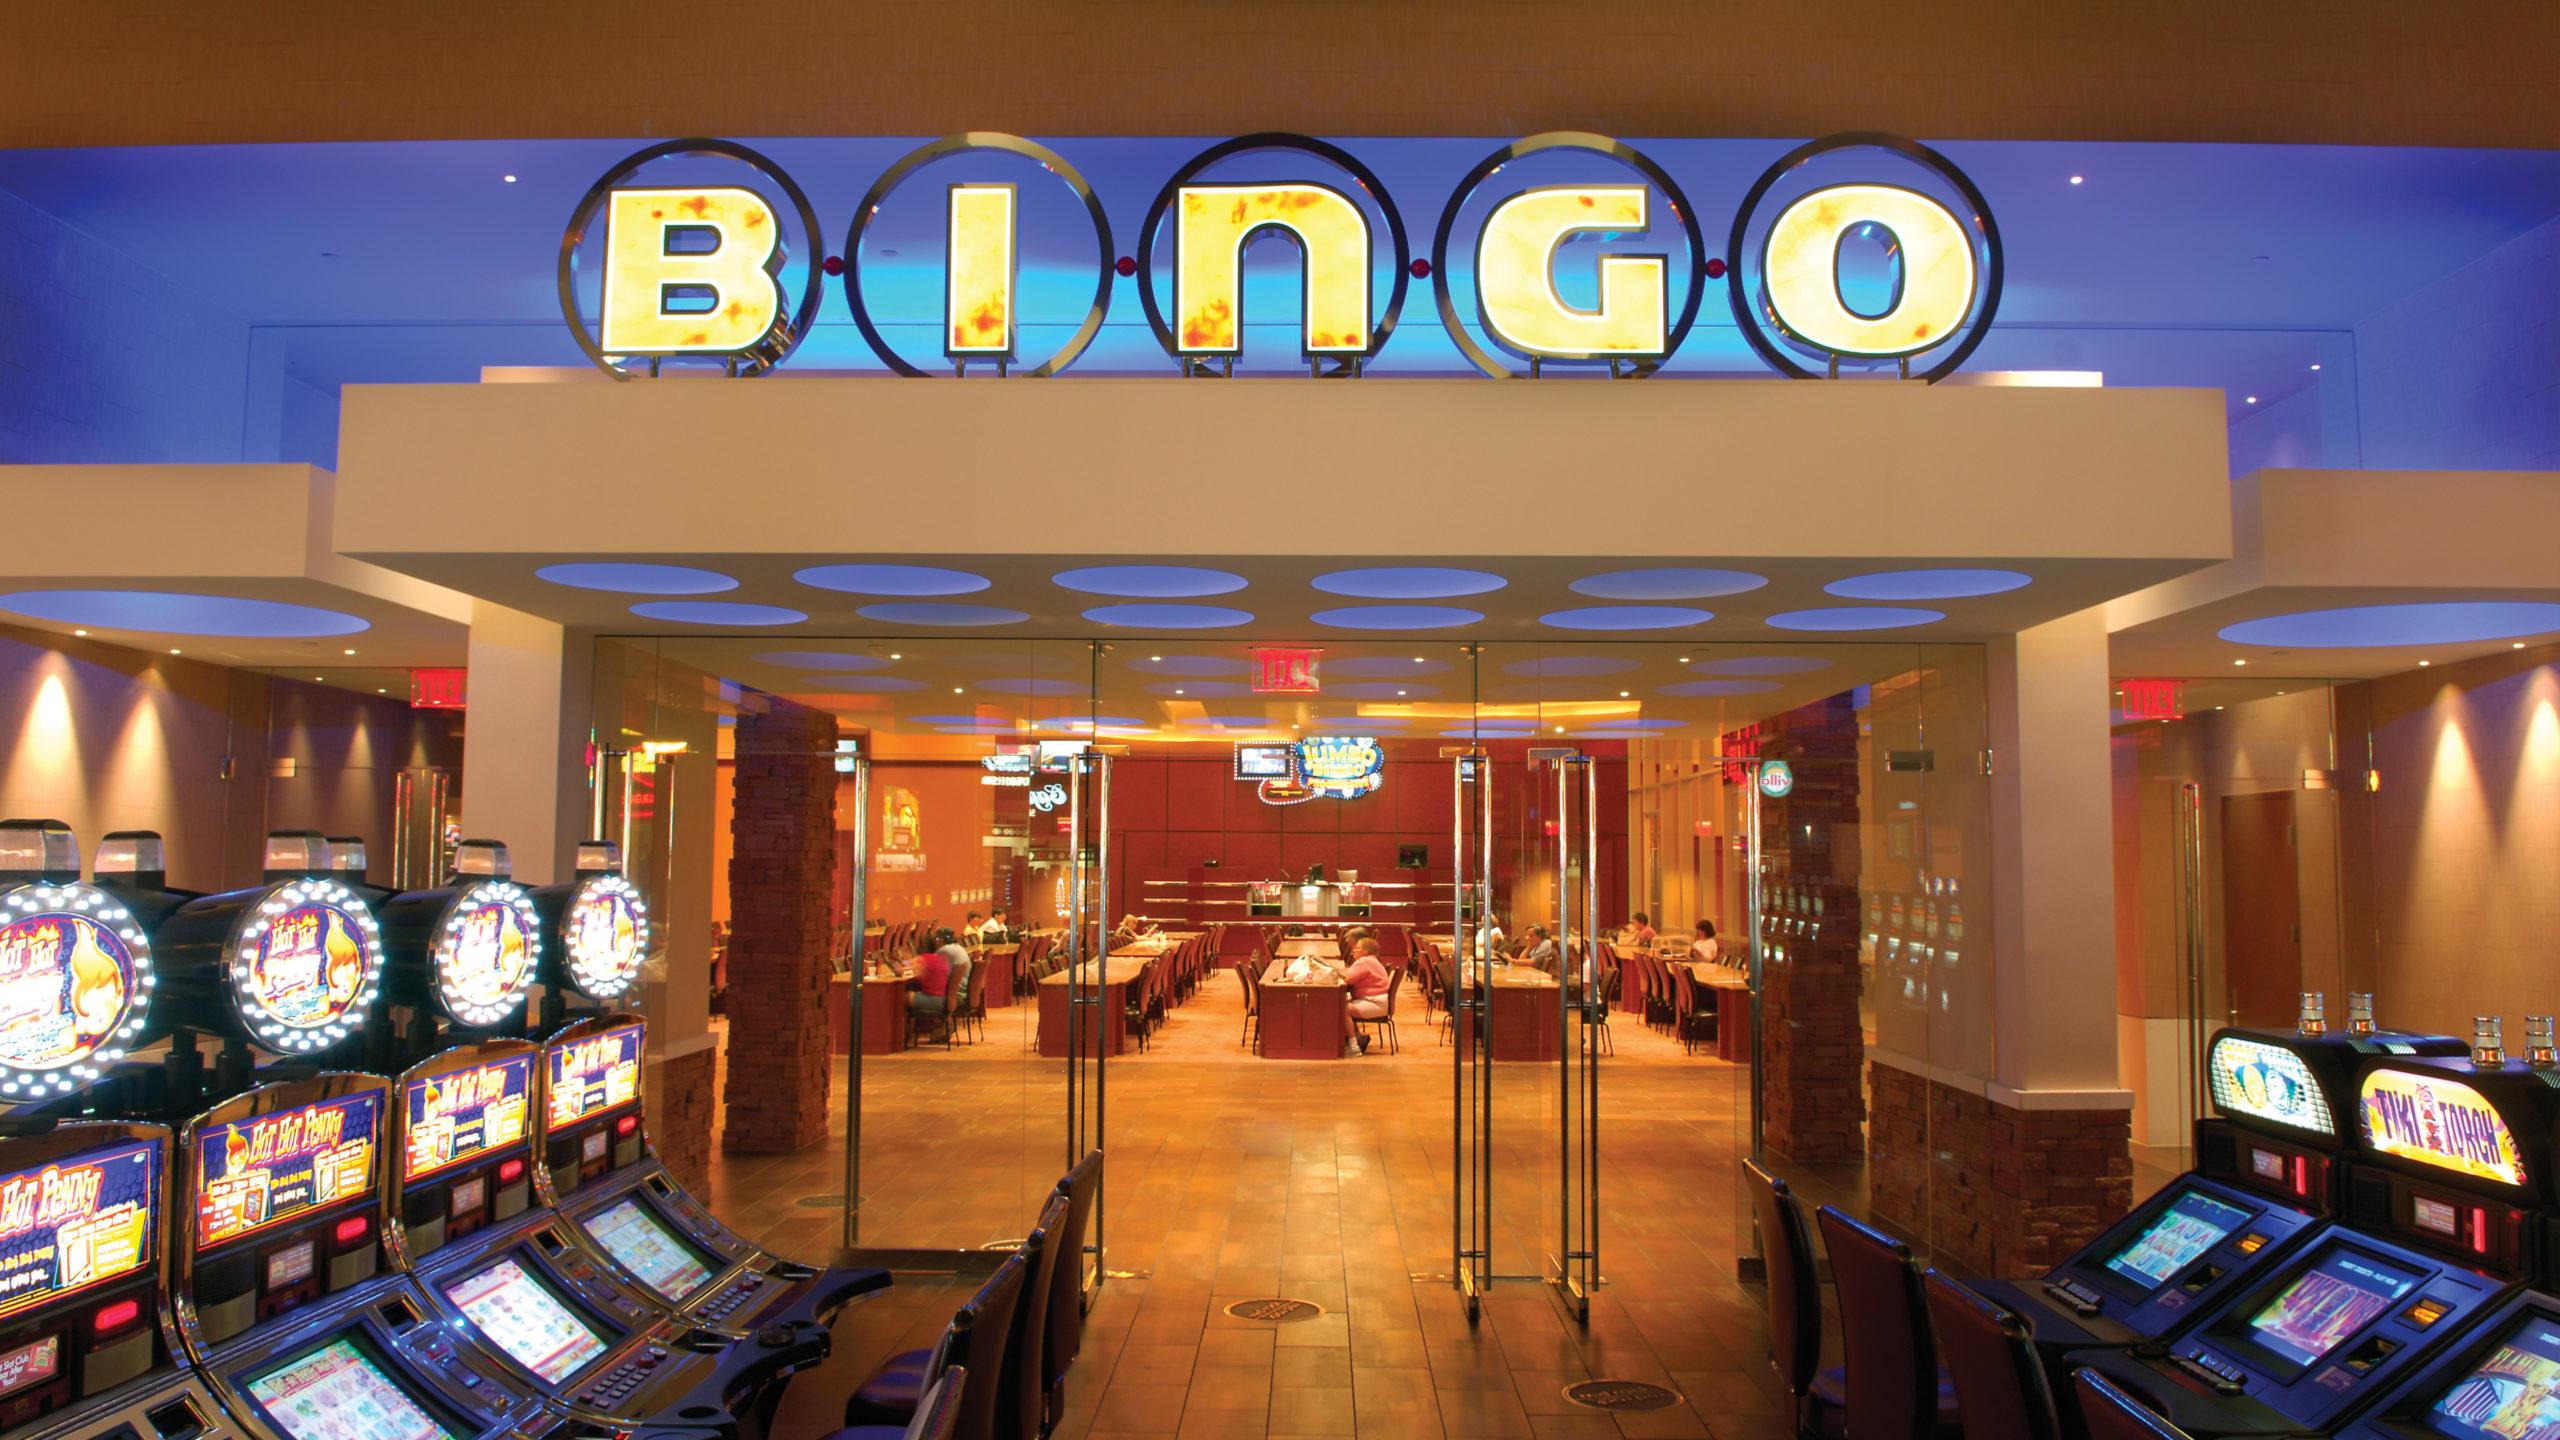 Station casinos bingo texas casino bus tours